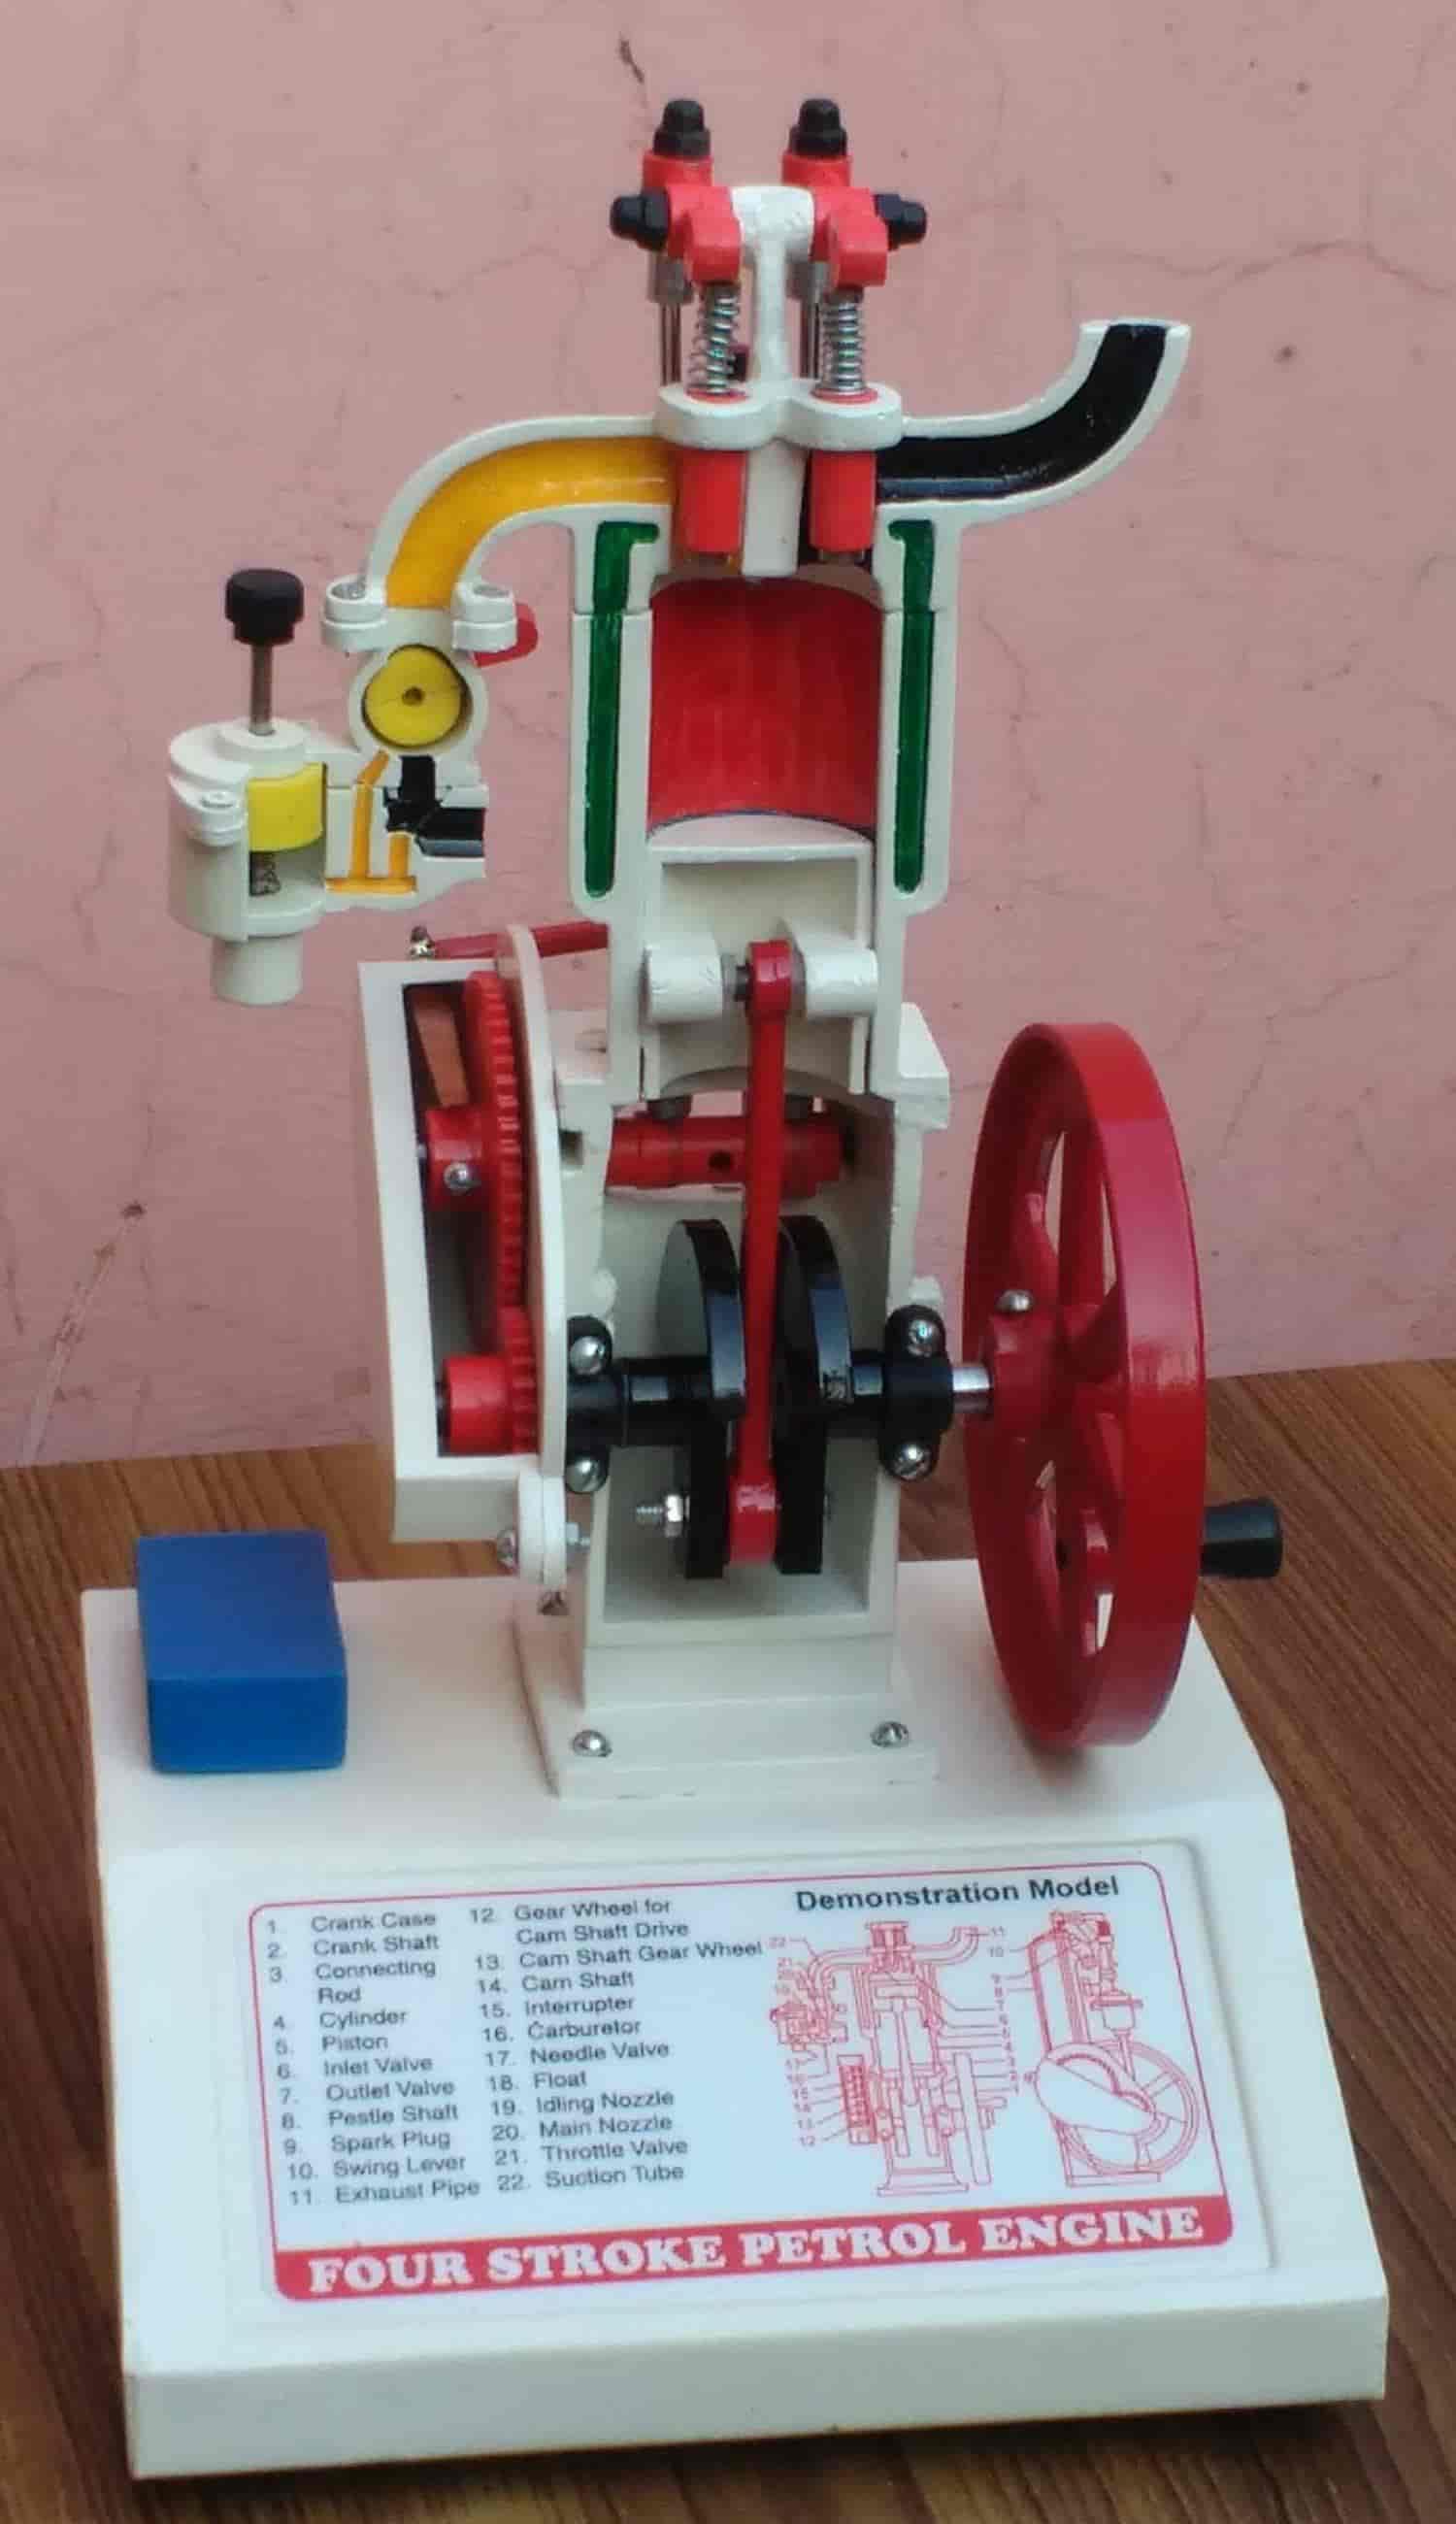 ... Four Stroke Petrol Engine Working Model - Advance Laboratory Supplies Co Photos, Azad Nagar, ...